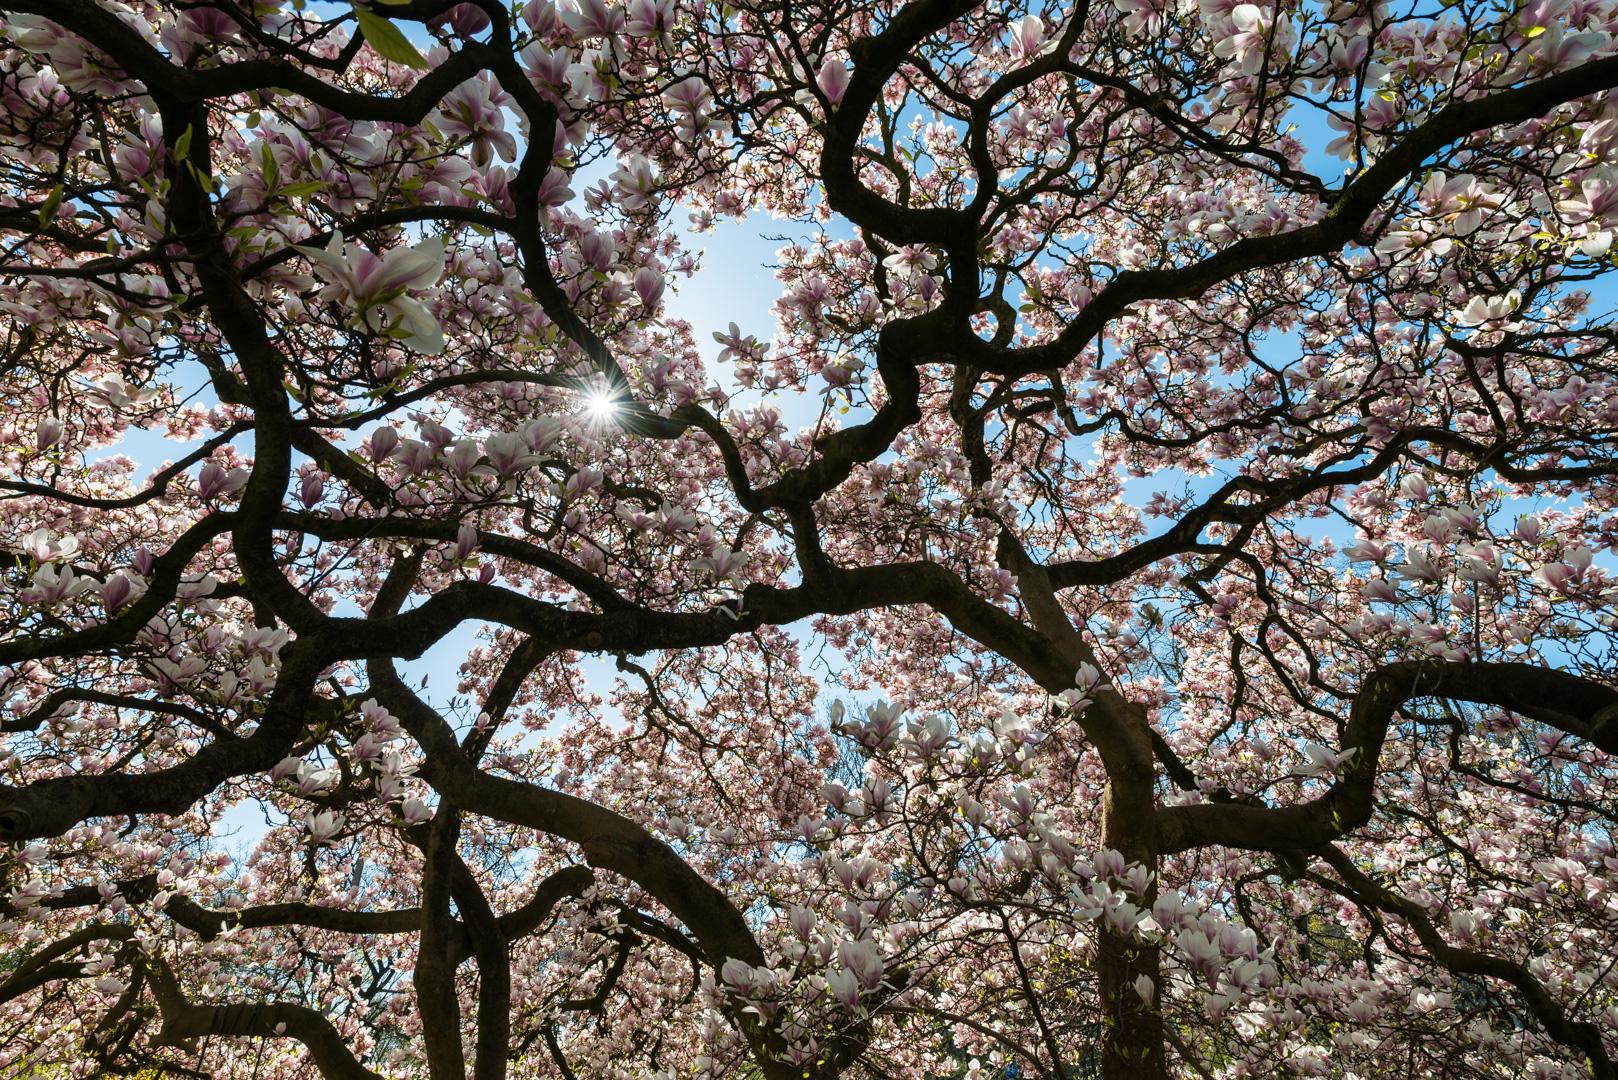 Bremen Magnolie Baum Baumkrone Magnolie Blüten